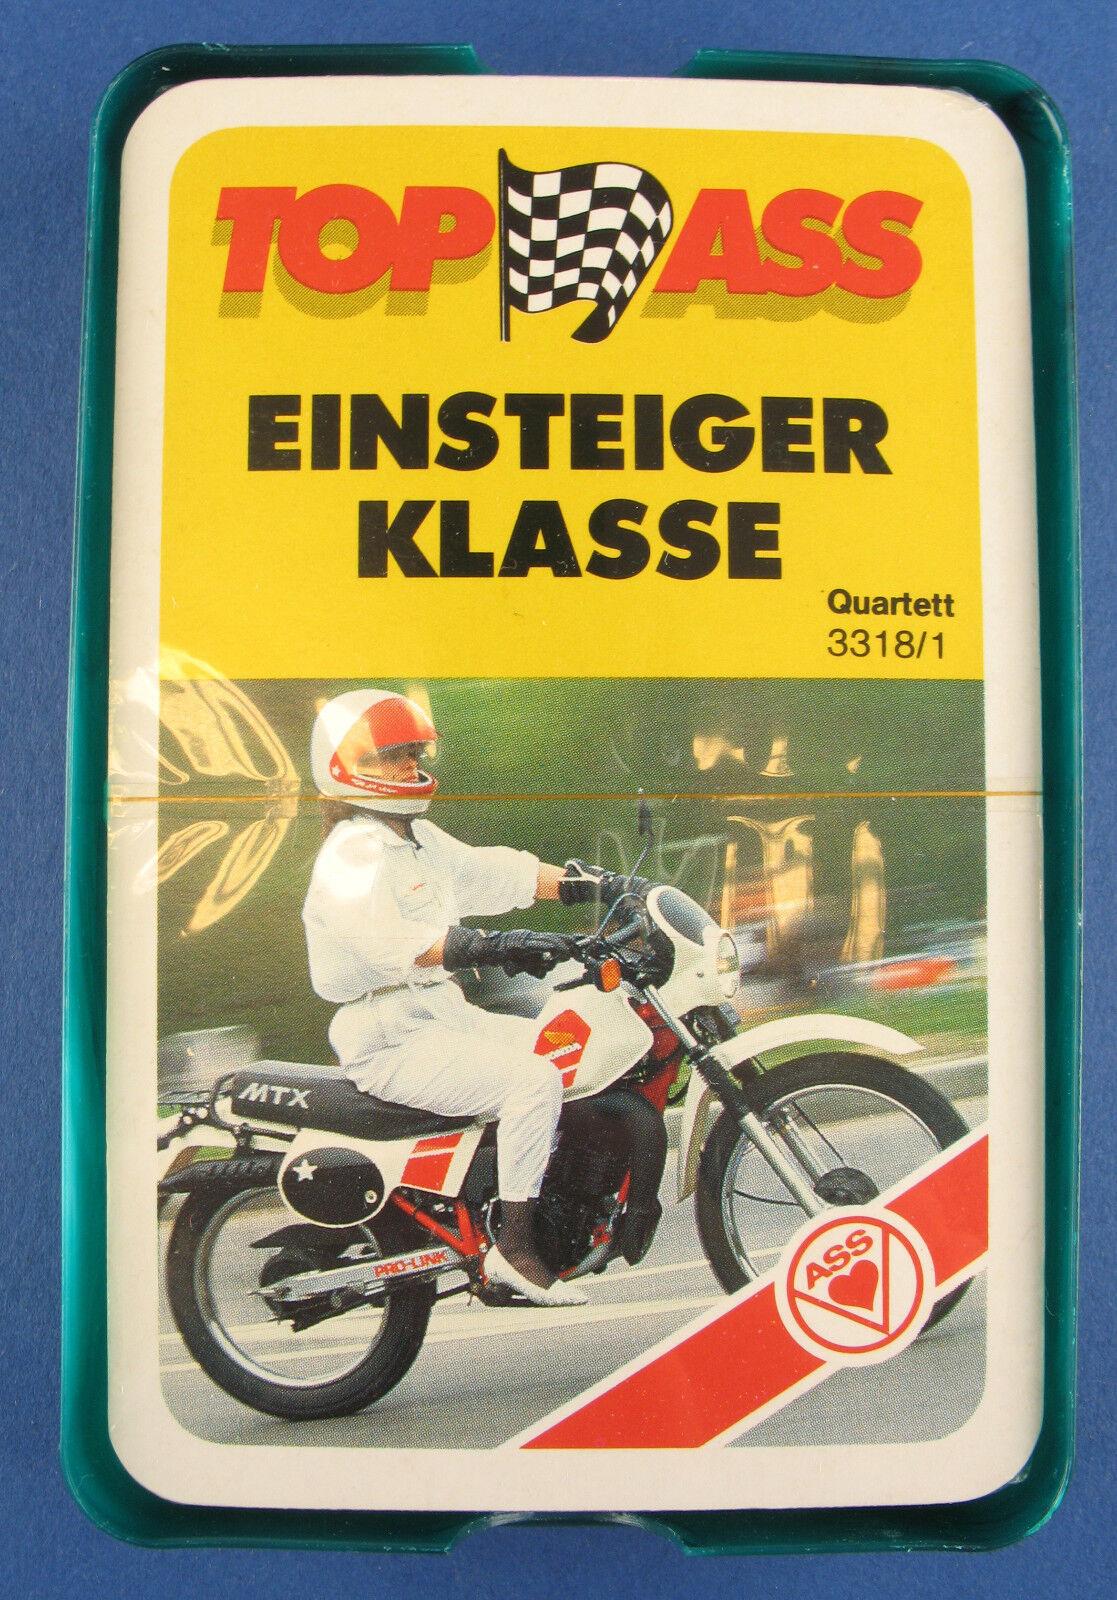 Quartett - EINSTEIGER KLASSE - ASS 3318 1 - NEU in Folie - 1985 - Motorrad